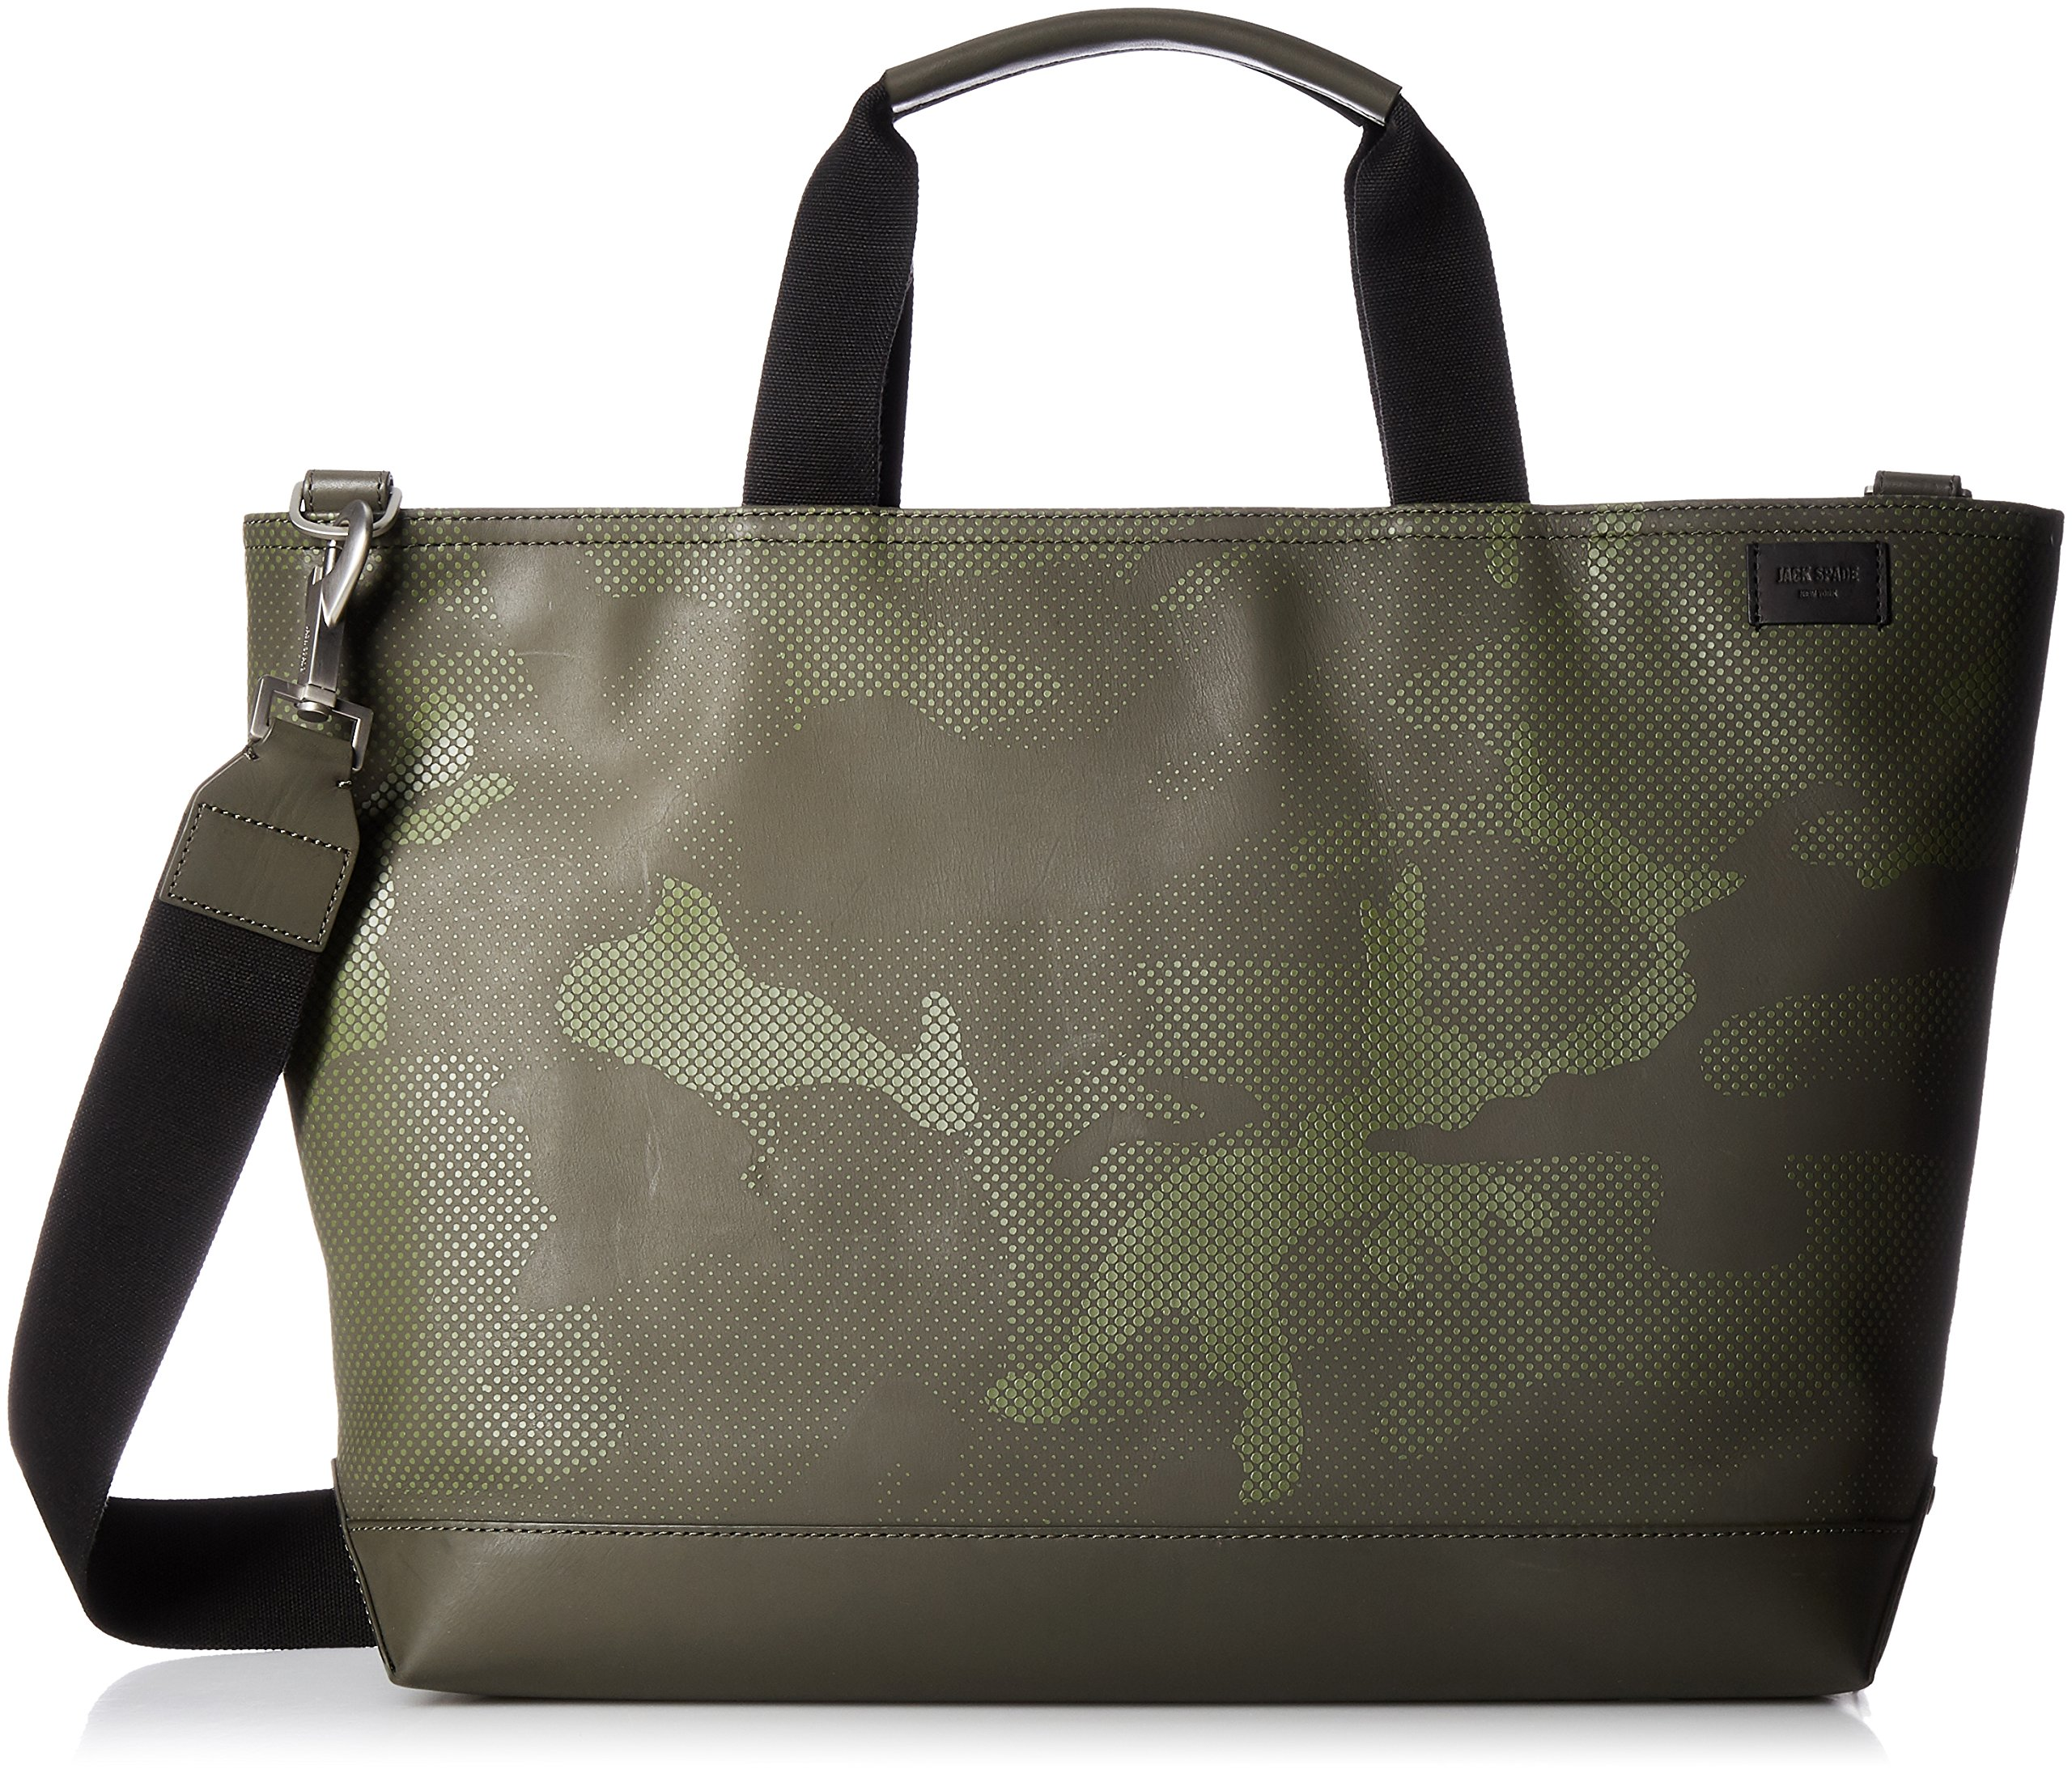 Jack Spade Men's Camo Dots Coal Bag, Army Green by Jack Spade (Image #1)